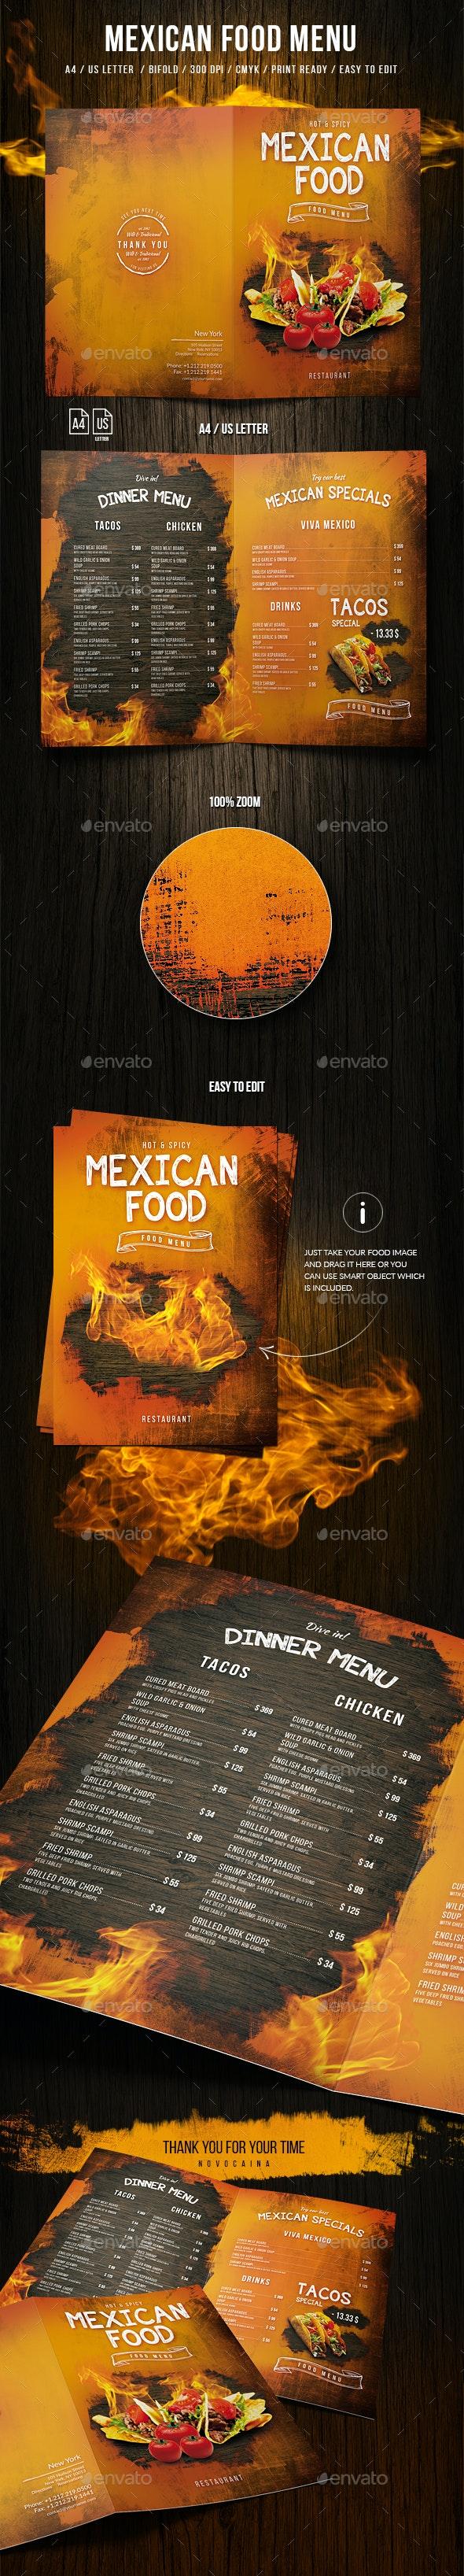 Mexican A4 and US Letter Food Menu - Food Menus Print Templates